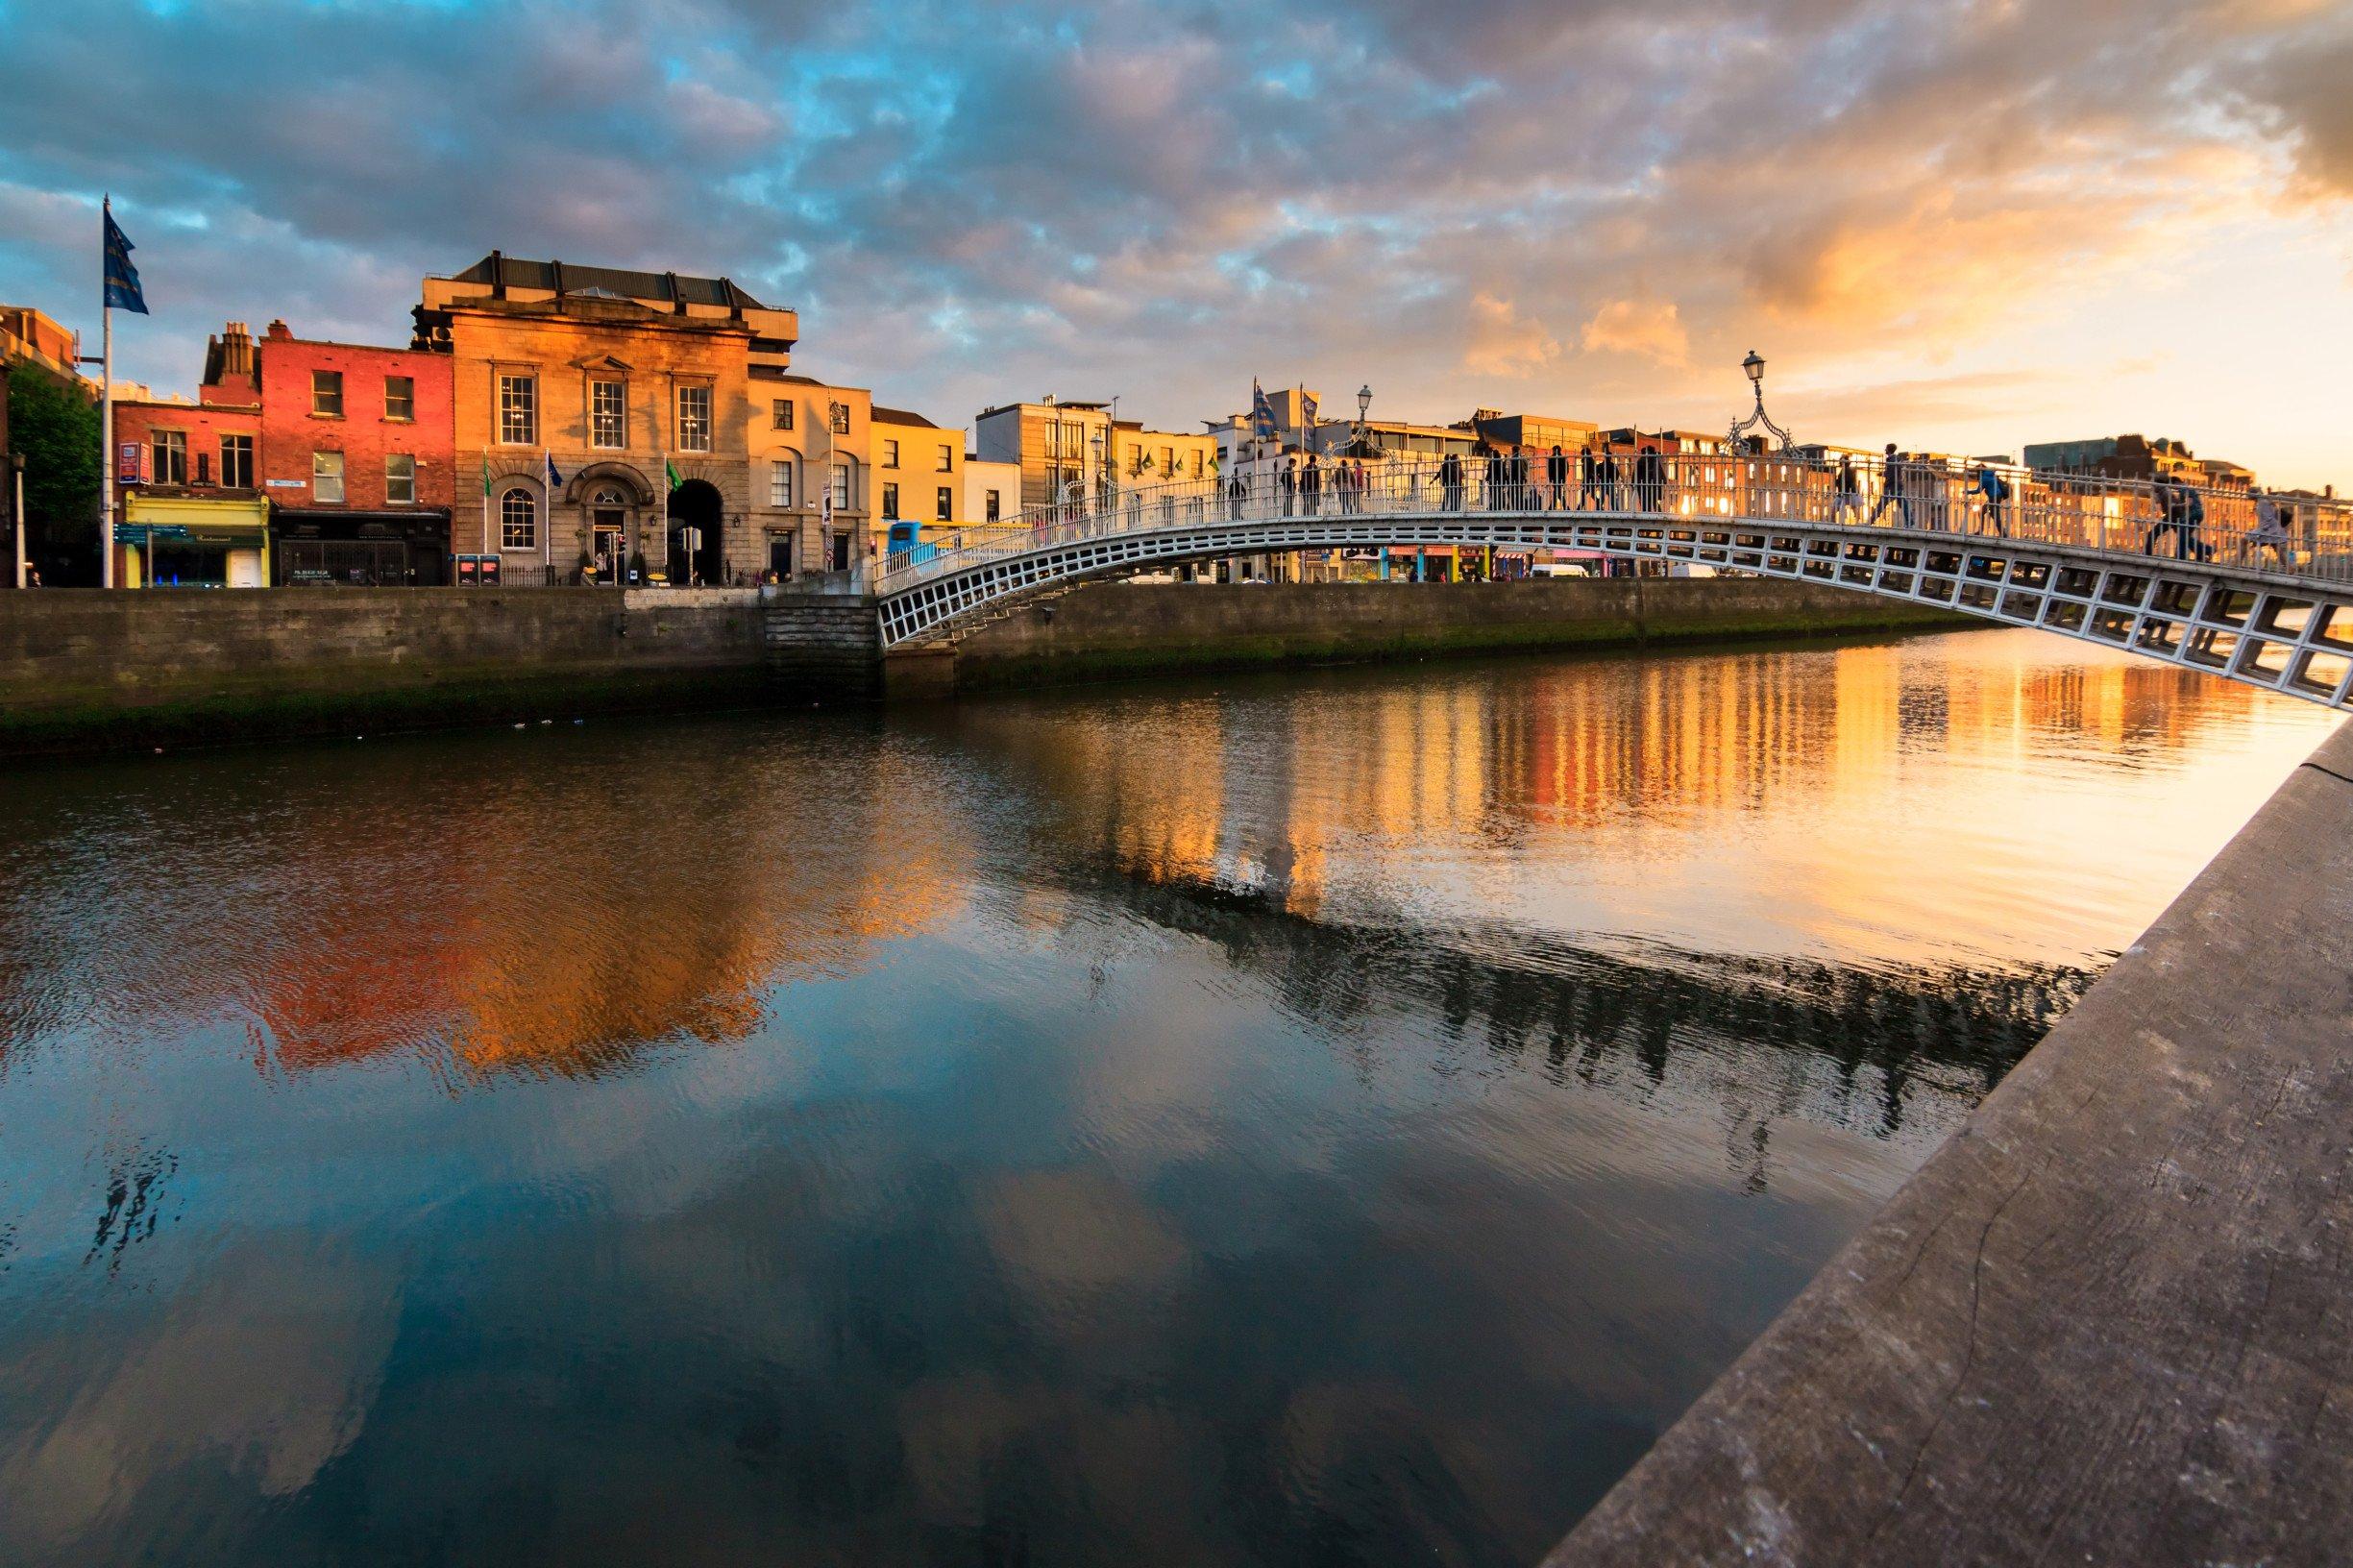 Dublin Ireland Ulysses by James Joyce